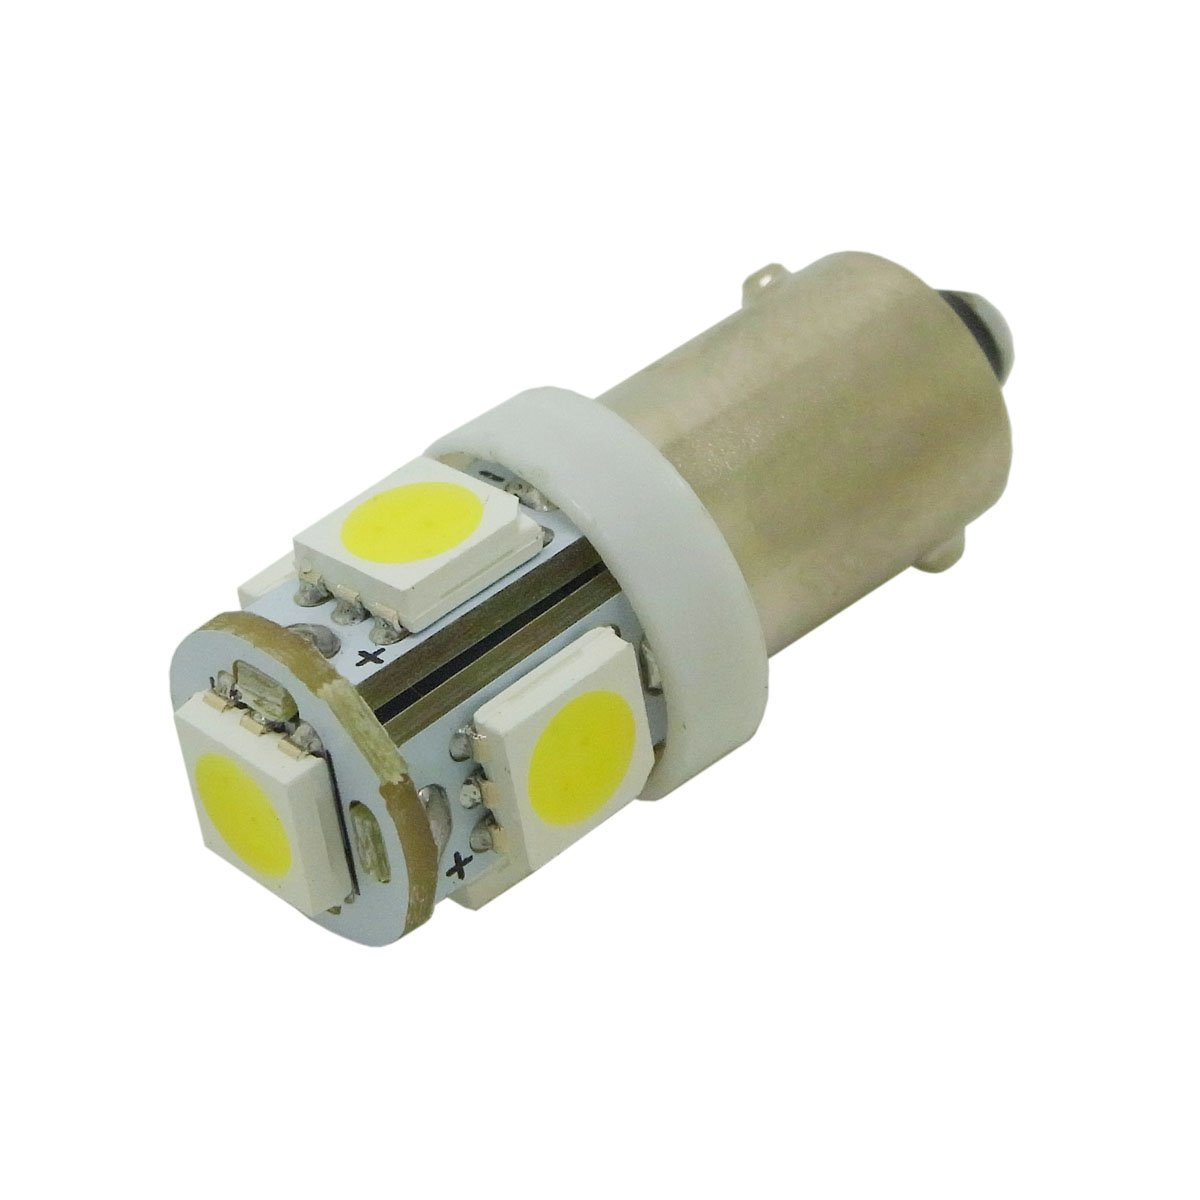 BAX9S led light, DC 12V, 5050 SMD, T4W 64111 64113 BA9 LED Car Interior Bulbs Map Reading Parking Light 4 Pack Ledingway ligting Co. Ltd